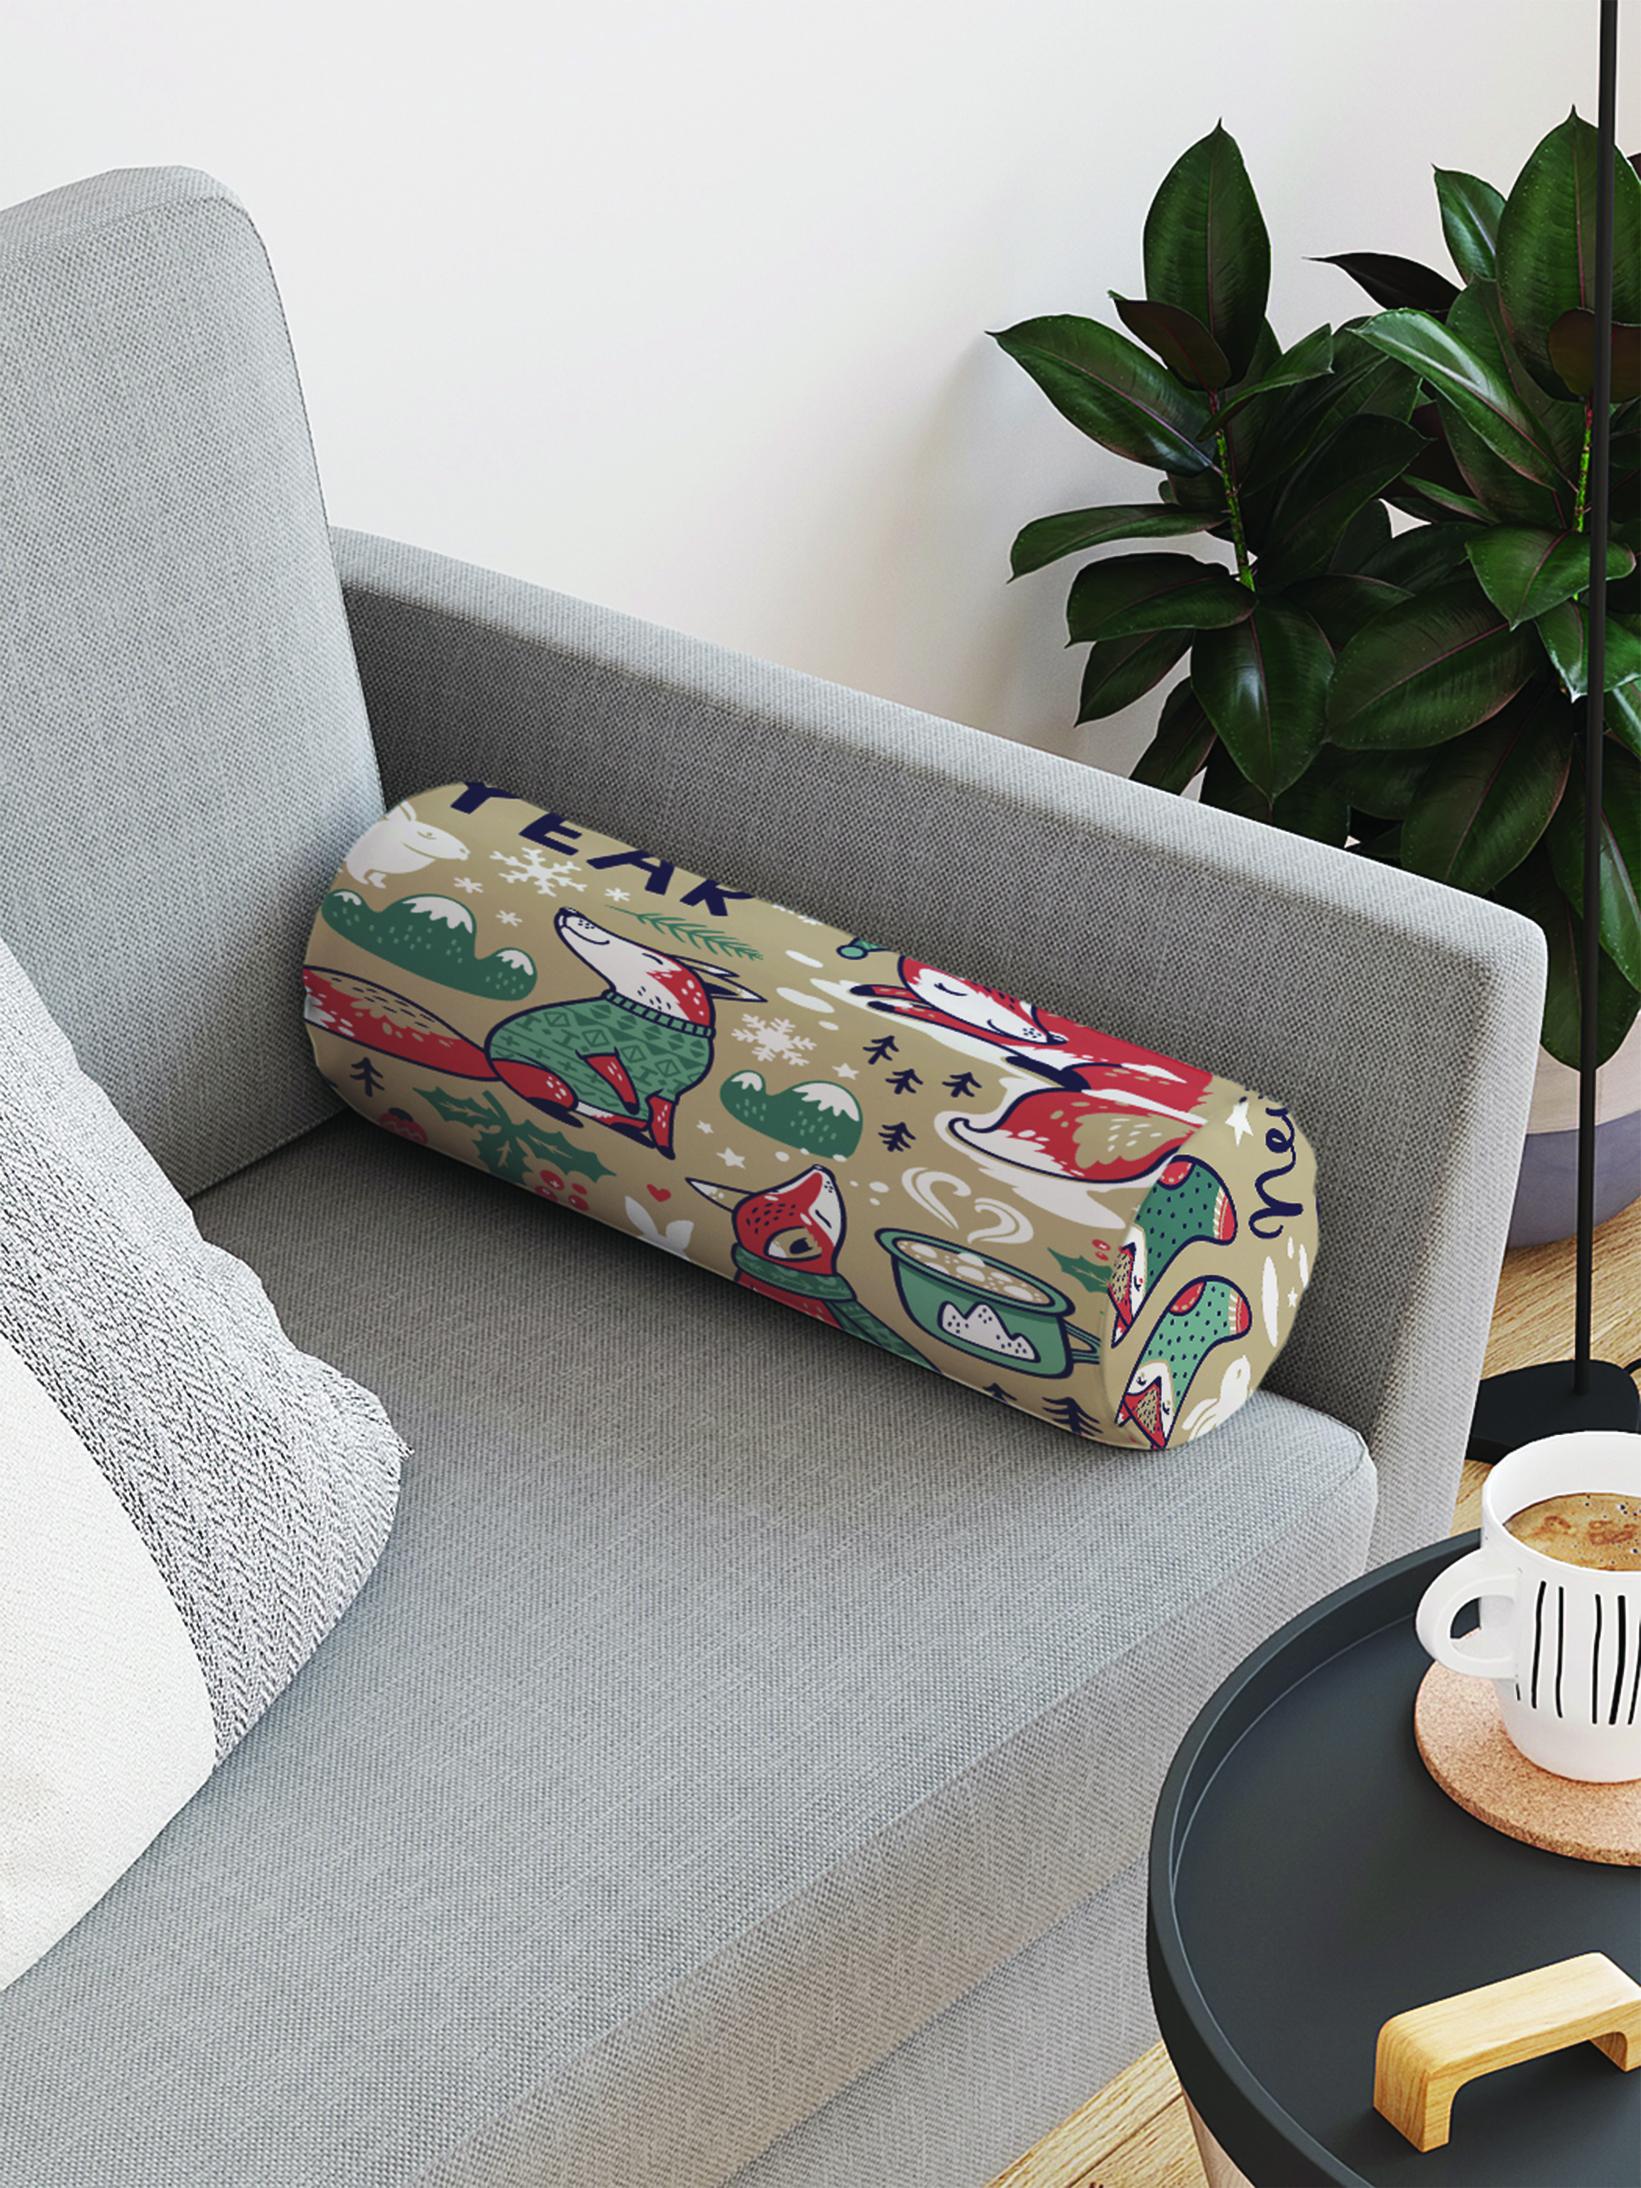 Декоративная подушка-валик «Лиса Алиса» на молнии, 45 см, диаметр 16 см